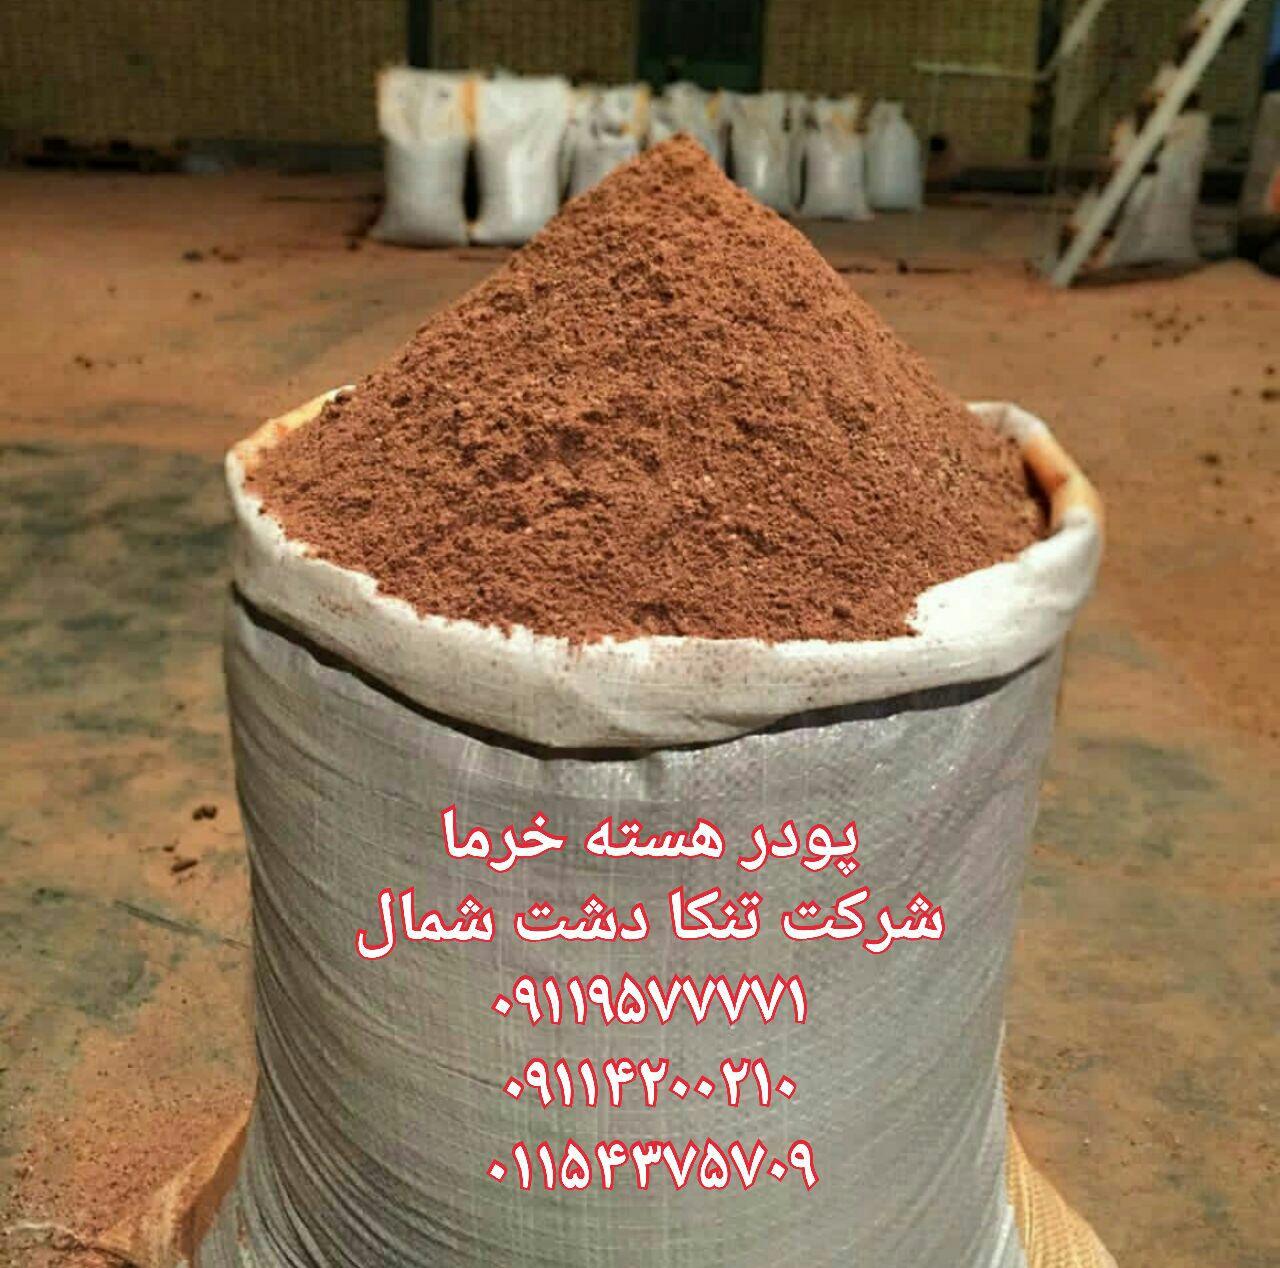 فروش پودر هسته خرما خوراک دام و طیور و آبزیان